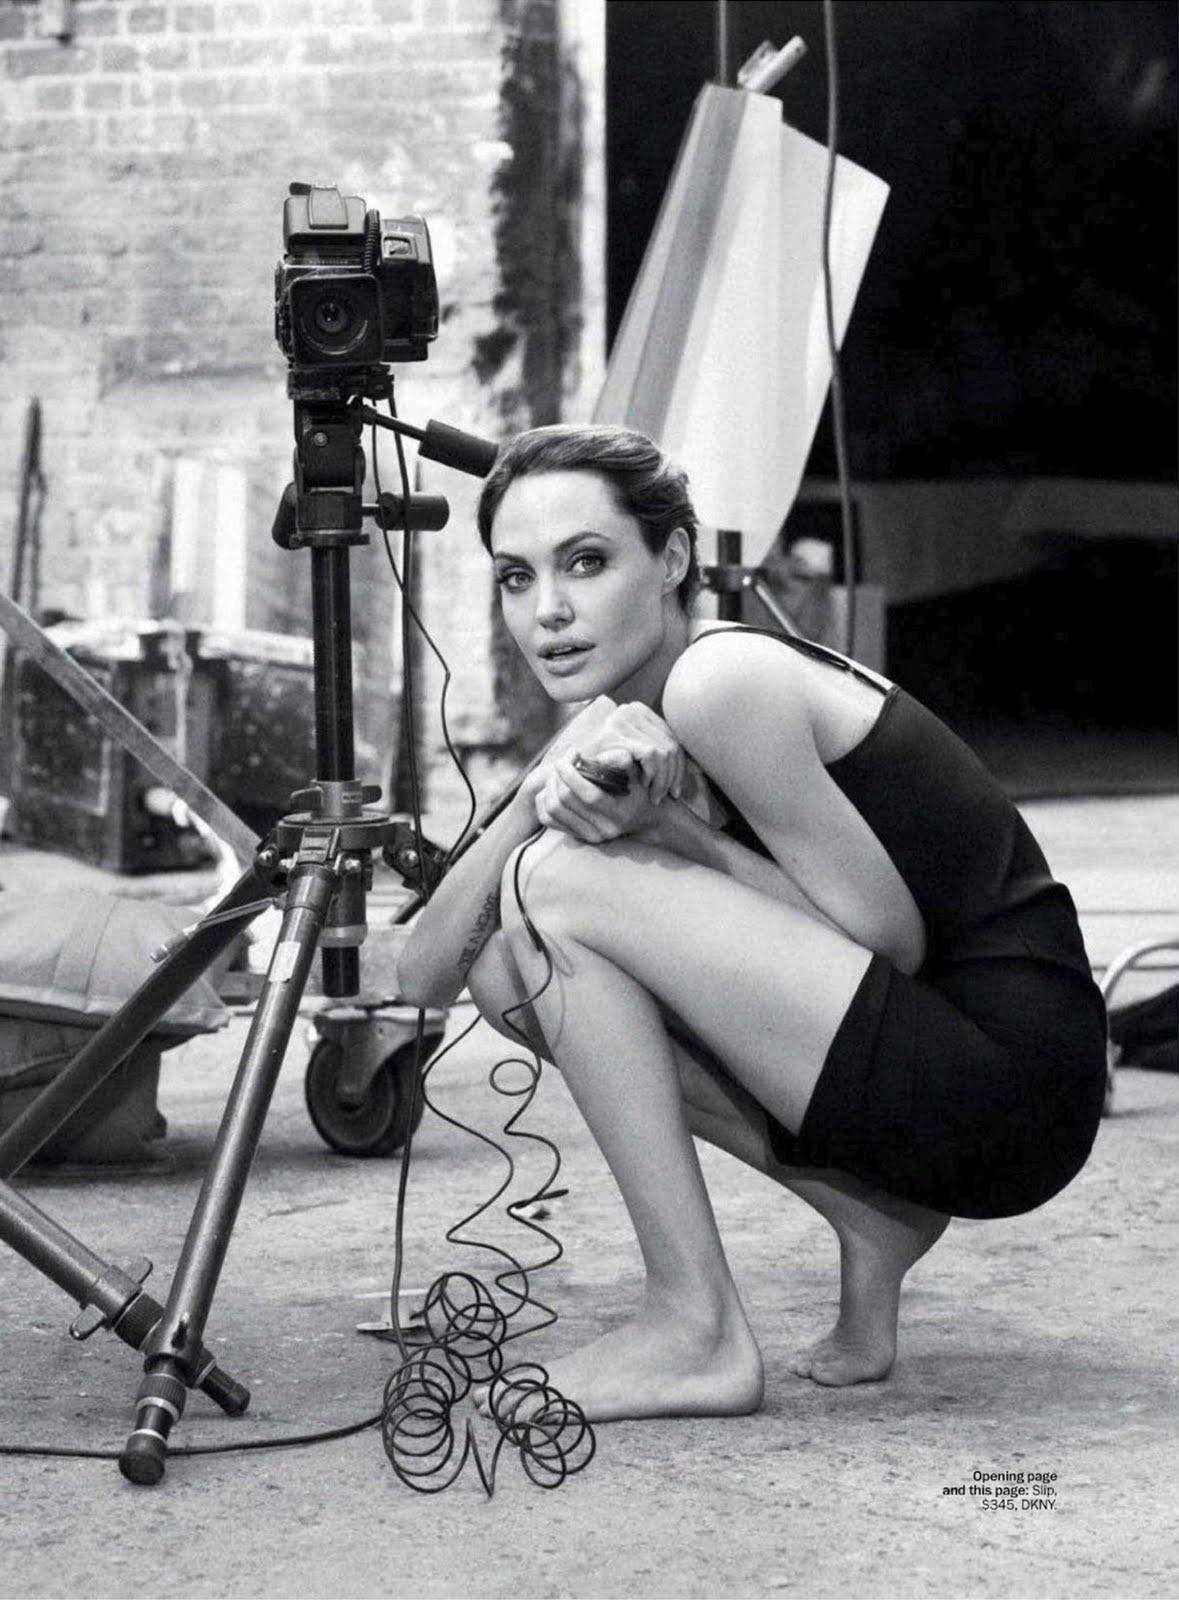 http://1.bp.blogspot.com/-XN4pvJW6lTU/TuC5HO4BJMI/AAAAAAAAhUE/NEmLxrznSRU/s1600/Angelina-Jolie-MarieClaire-6.jpg